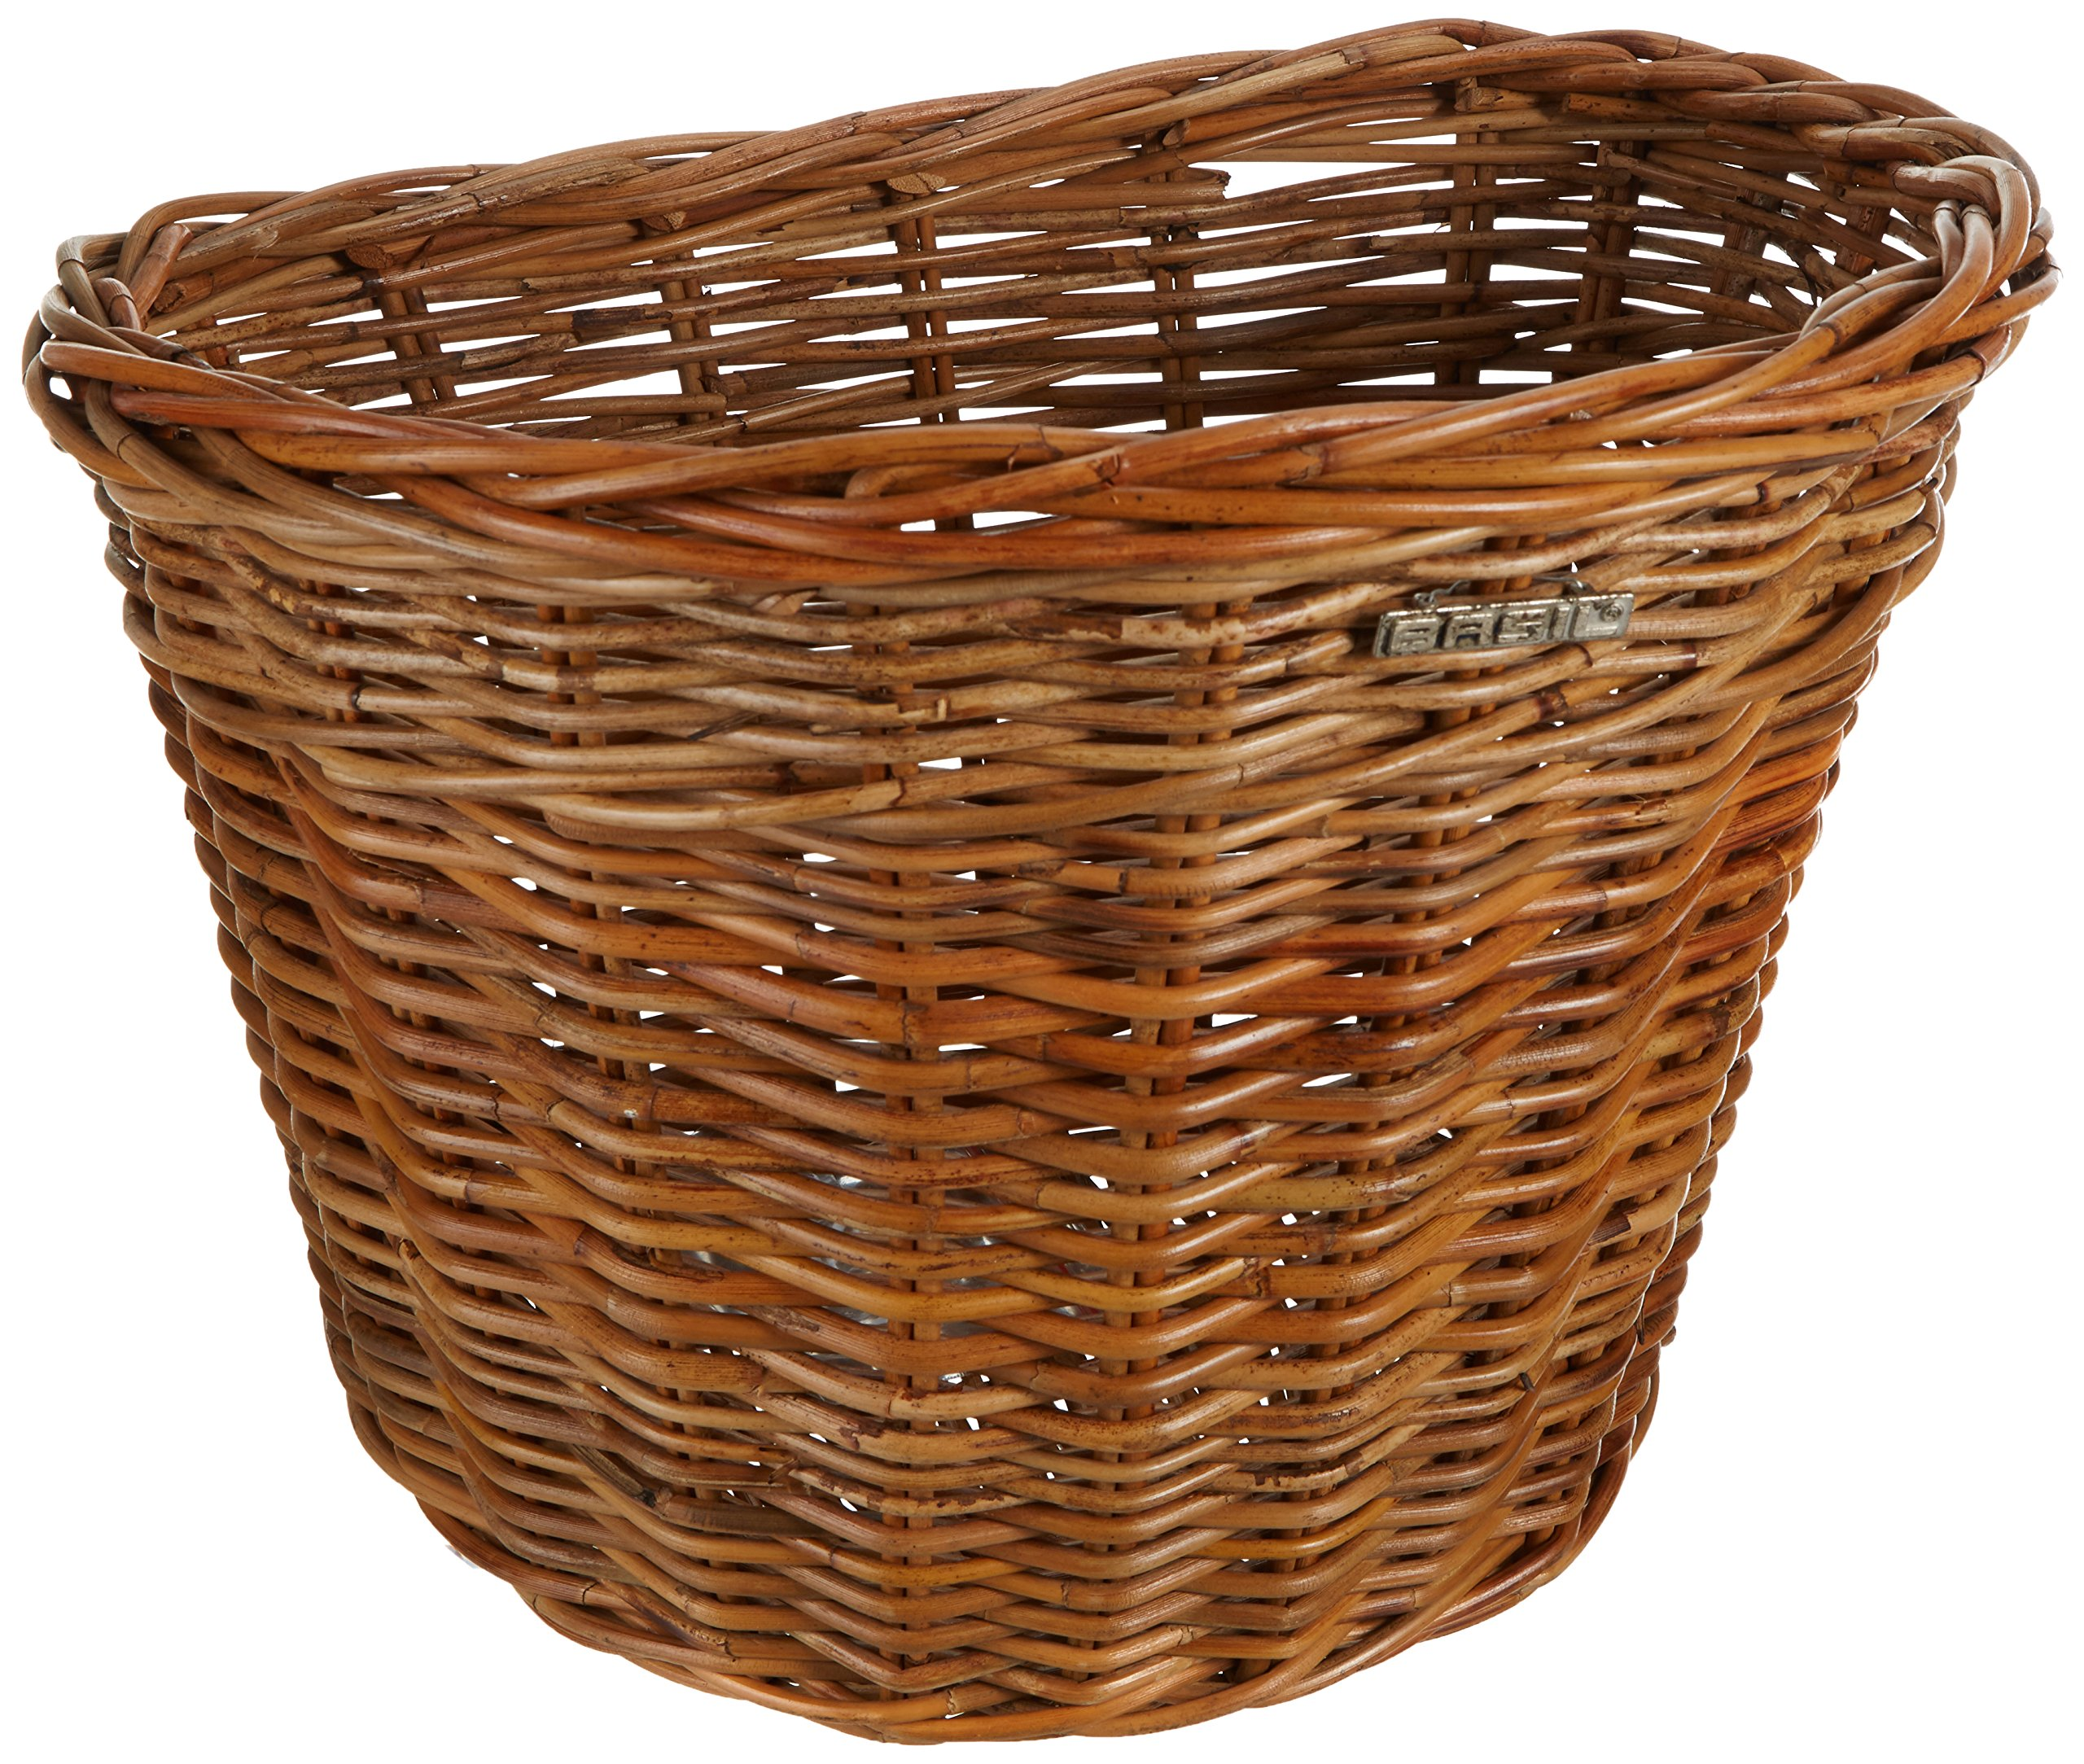 Bell Basil Darcy Bicycle Basket, Varnished Natural